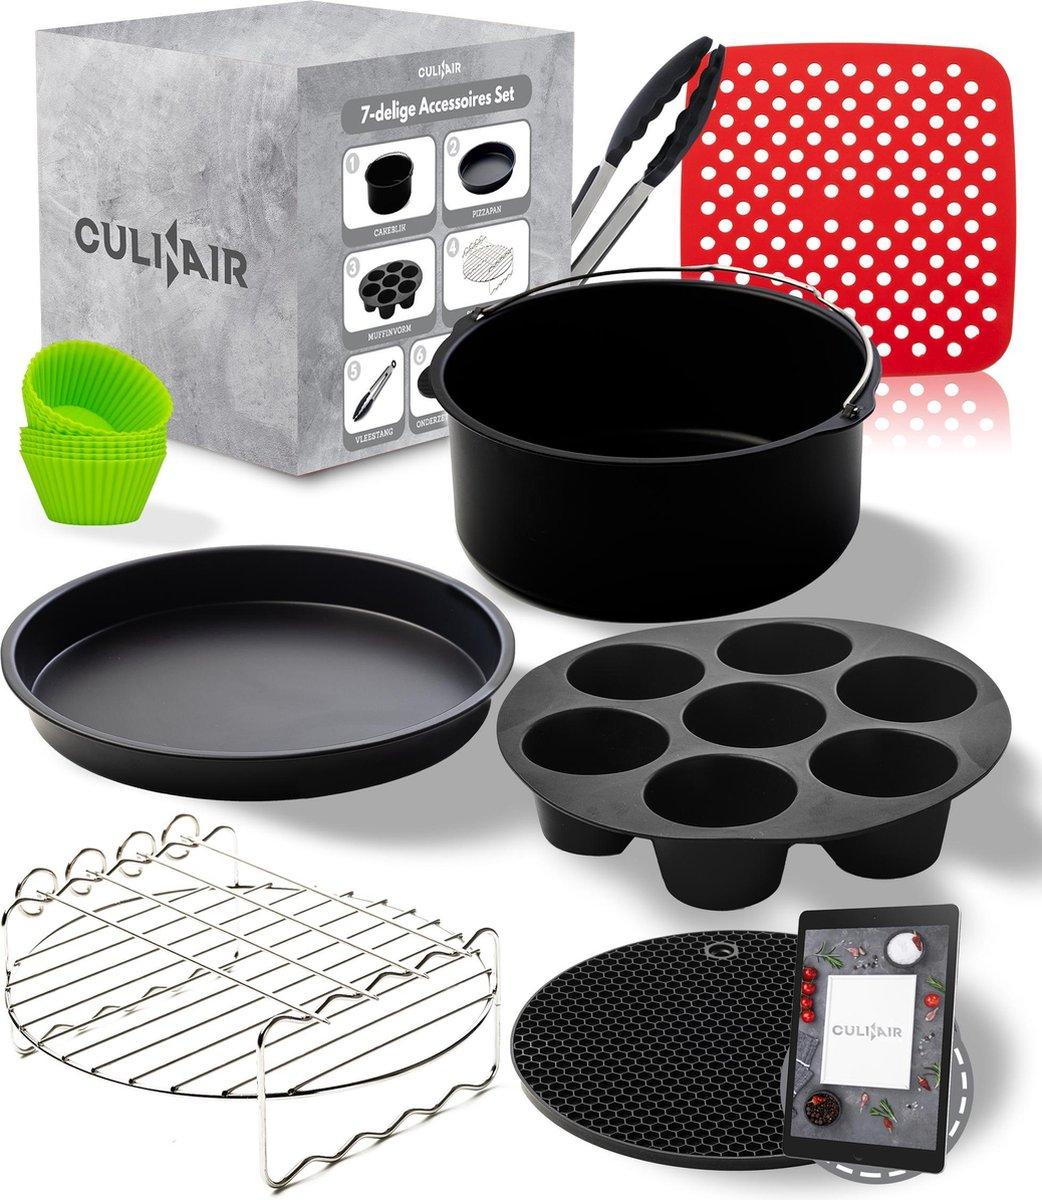 XL Airfryer Accessoires Set - Inclusief Cakeblik, Muffinvorm, Spiesenrek, Pizzapan, Muffin Cups, Bakmatje en Onderzetter